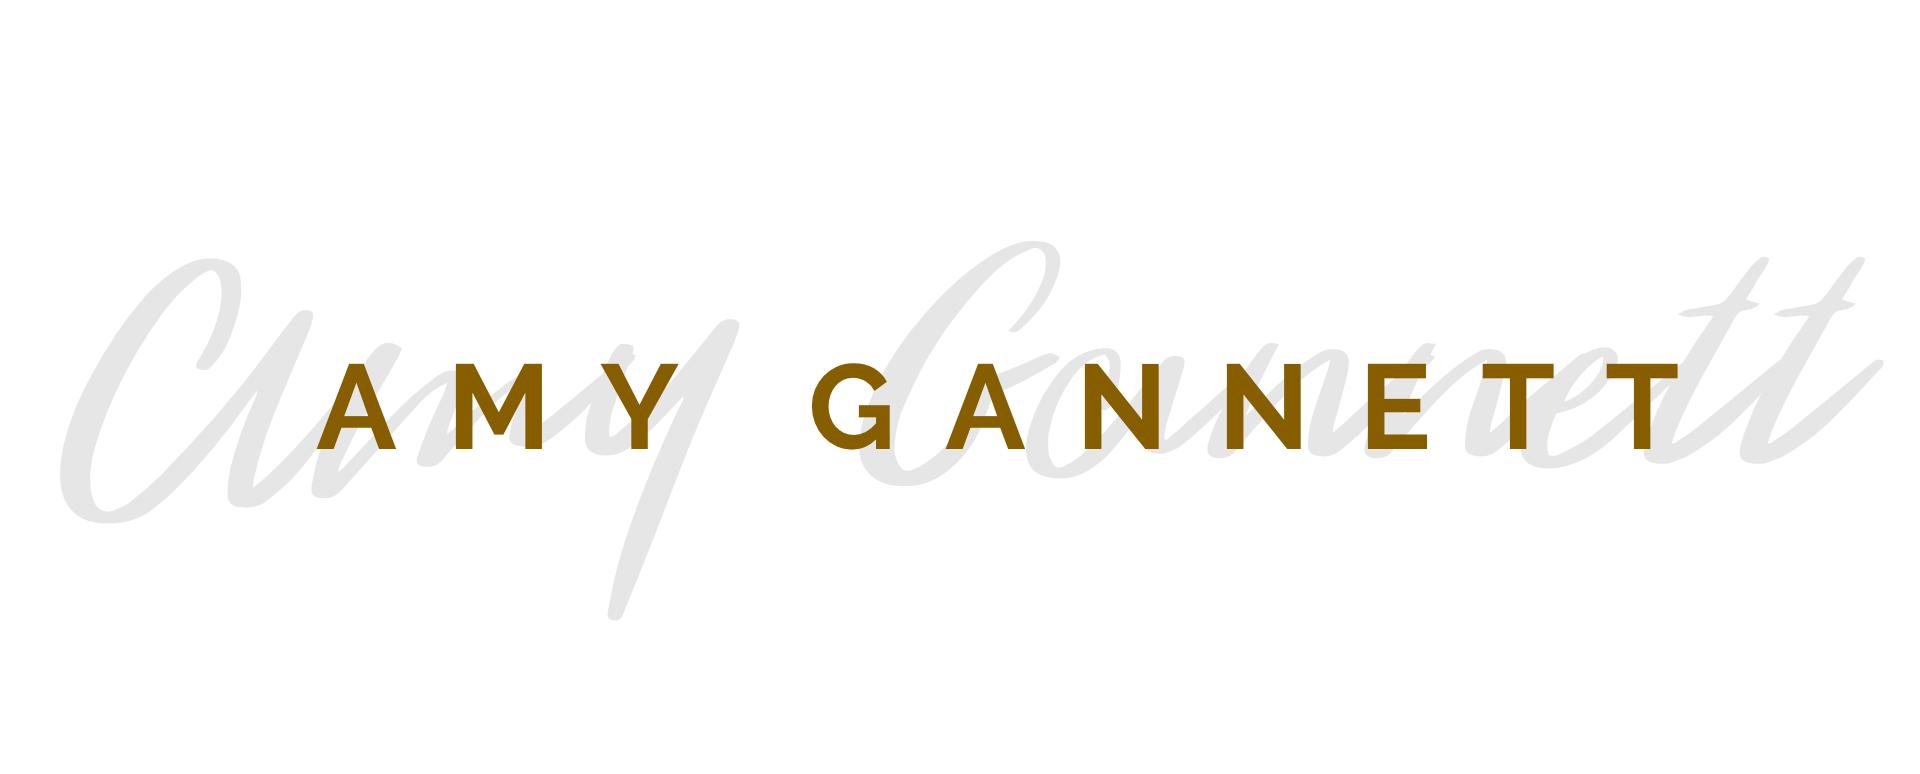 Amy Gannett